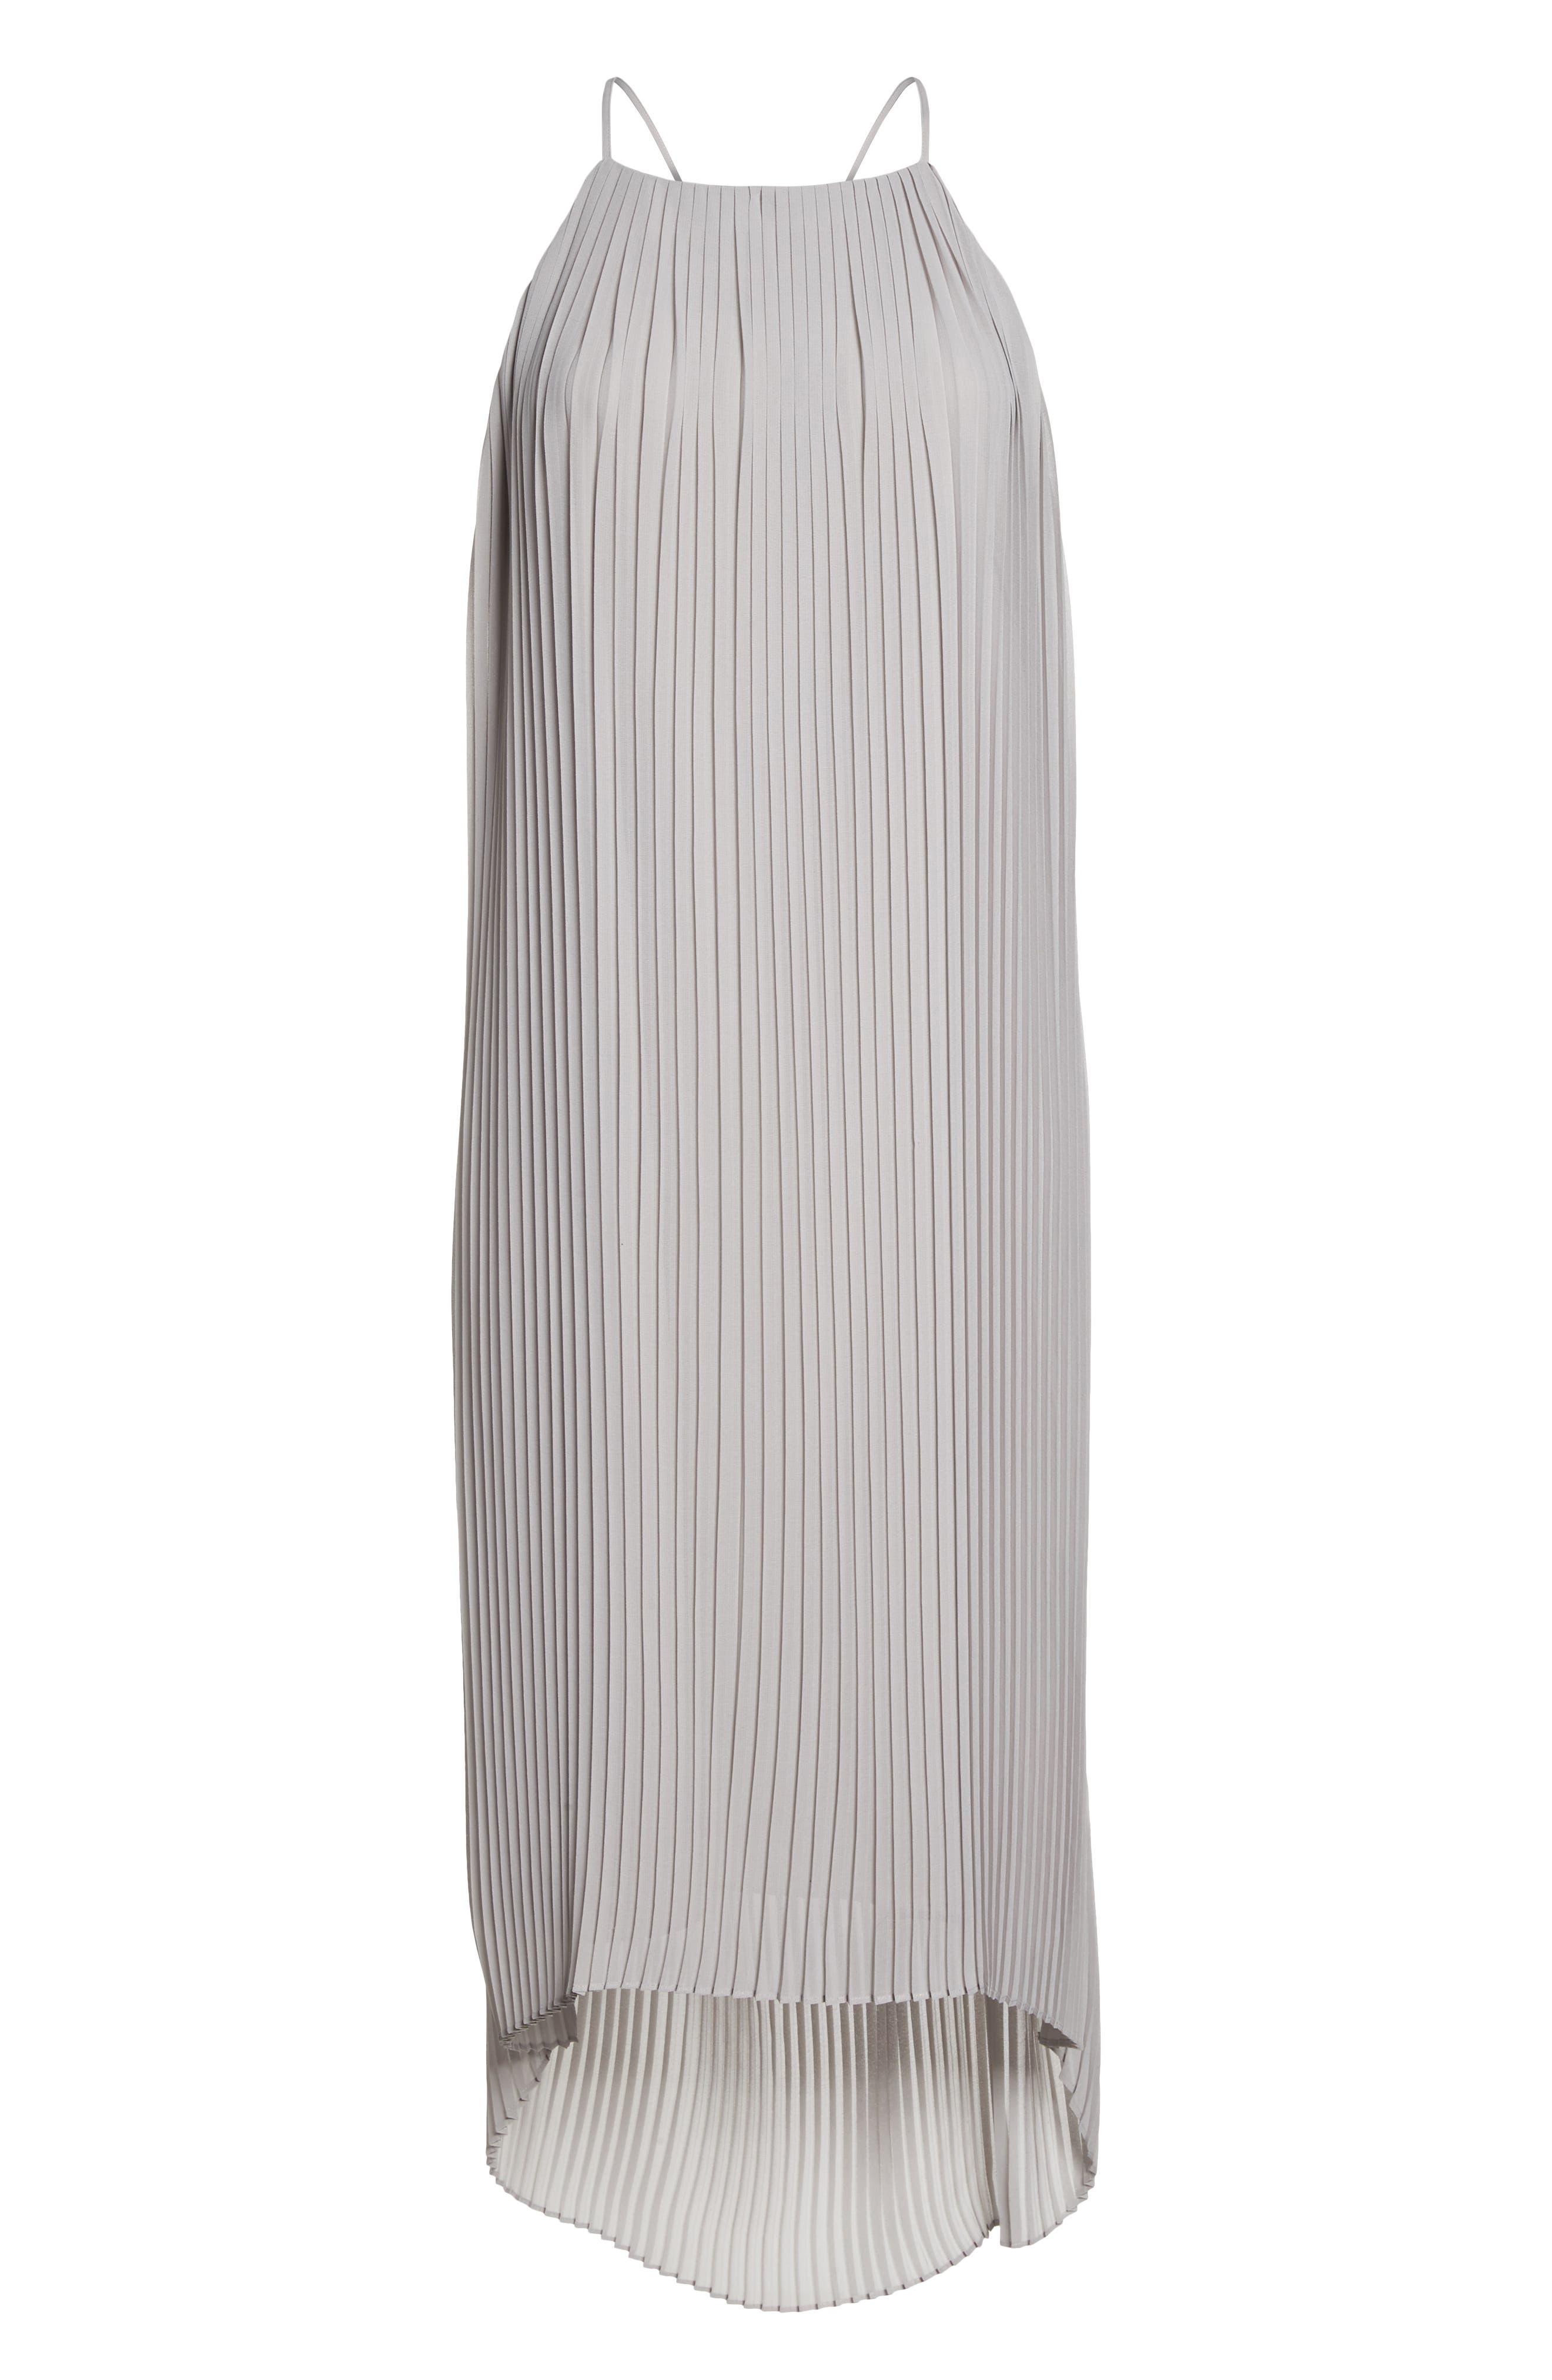 SAM EDELMAN,                             Pleated Midi Dress,                             Alternate thumbnail 7, color,                             077